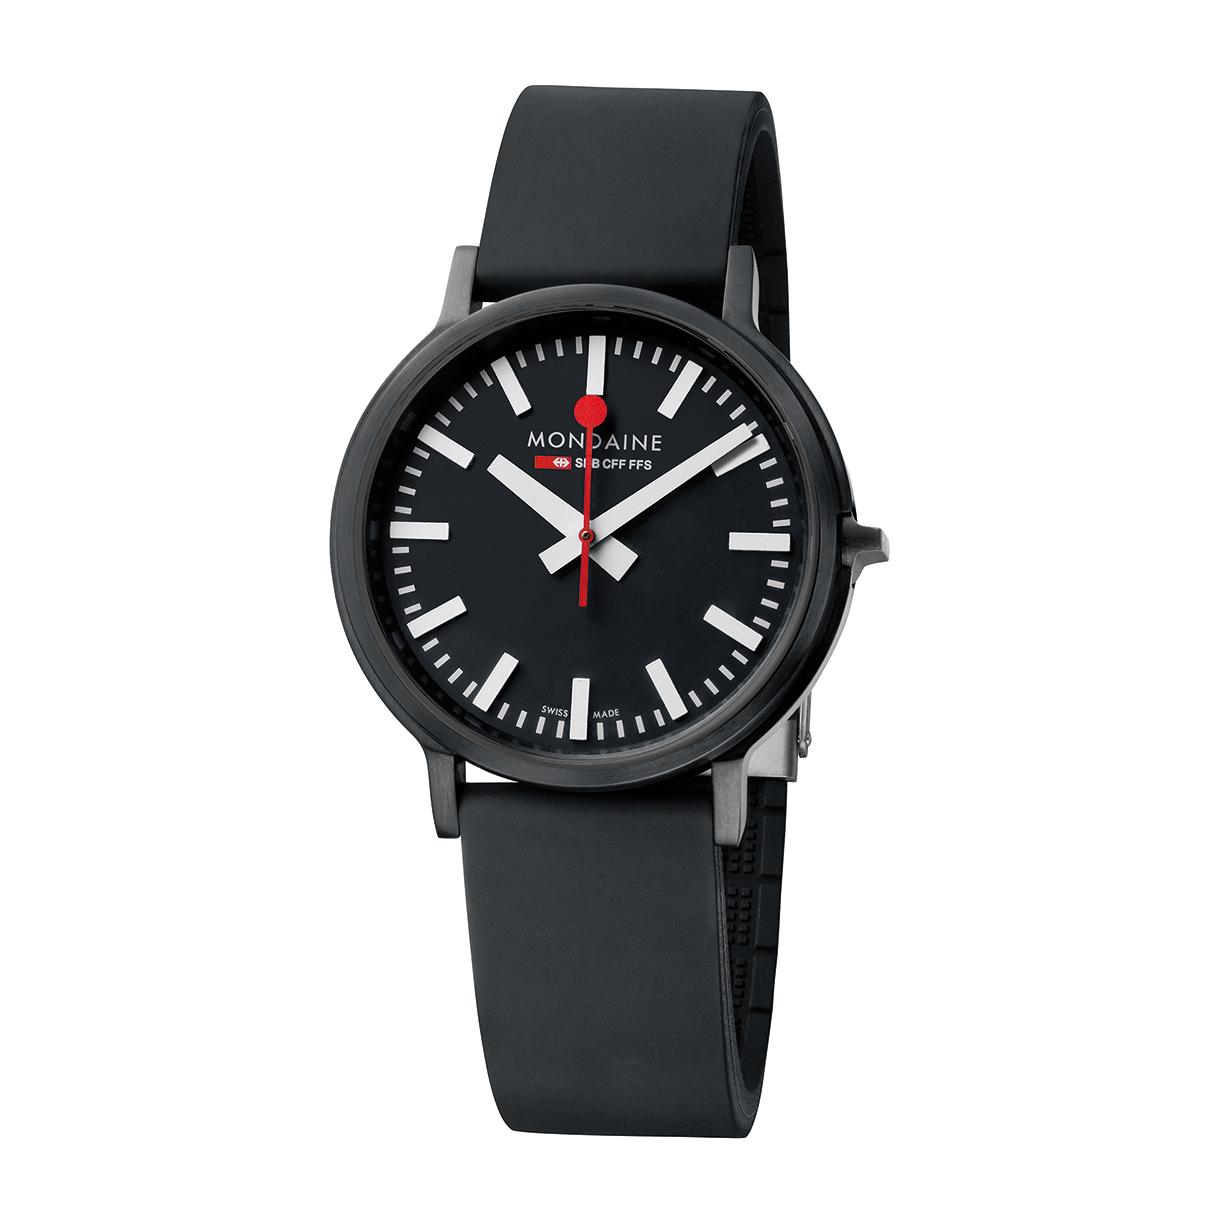 Mondaine watch - Mondaine travel clock ...